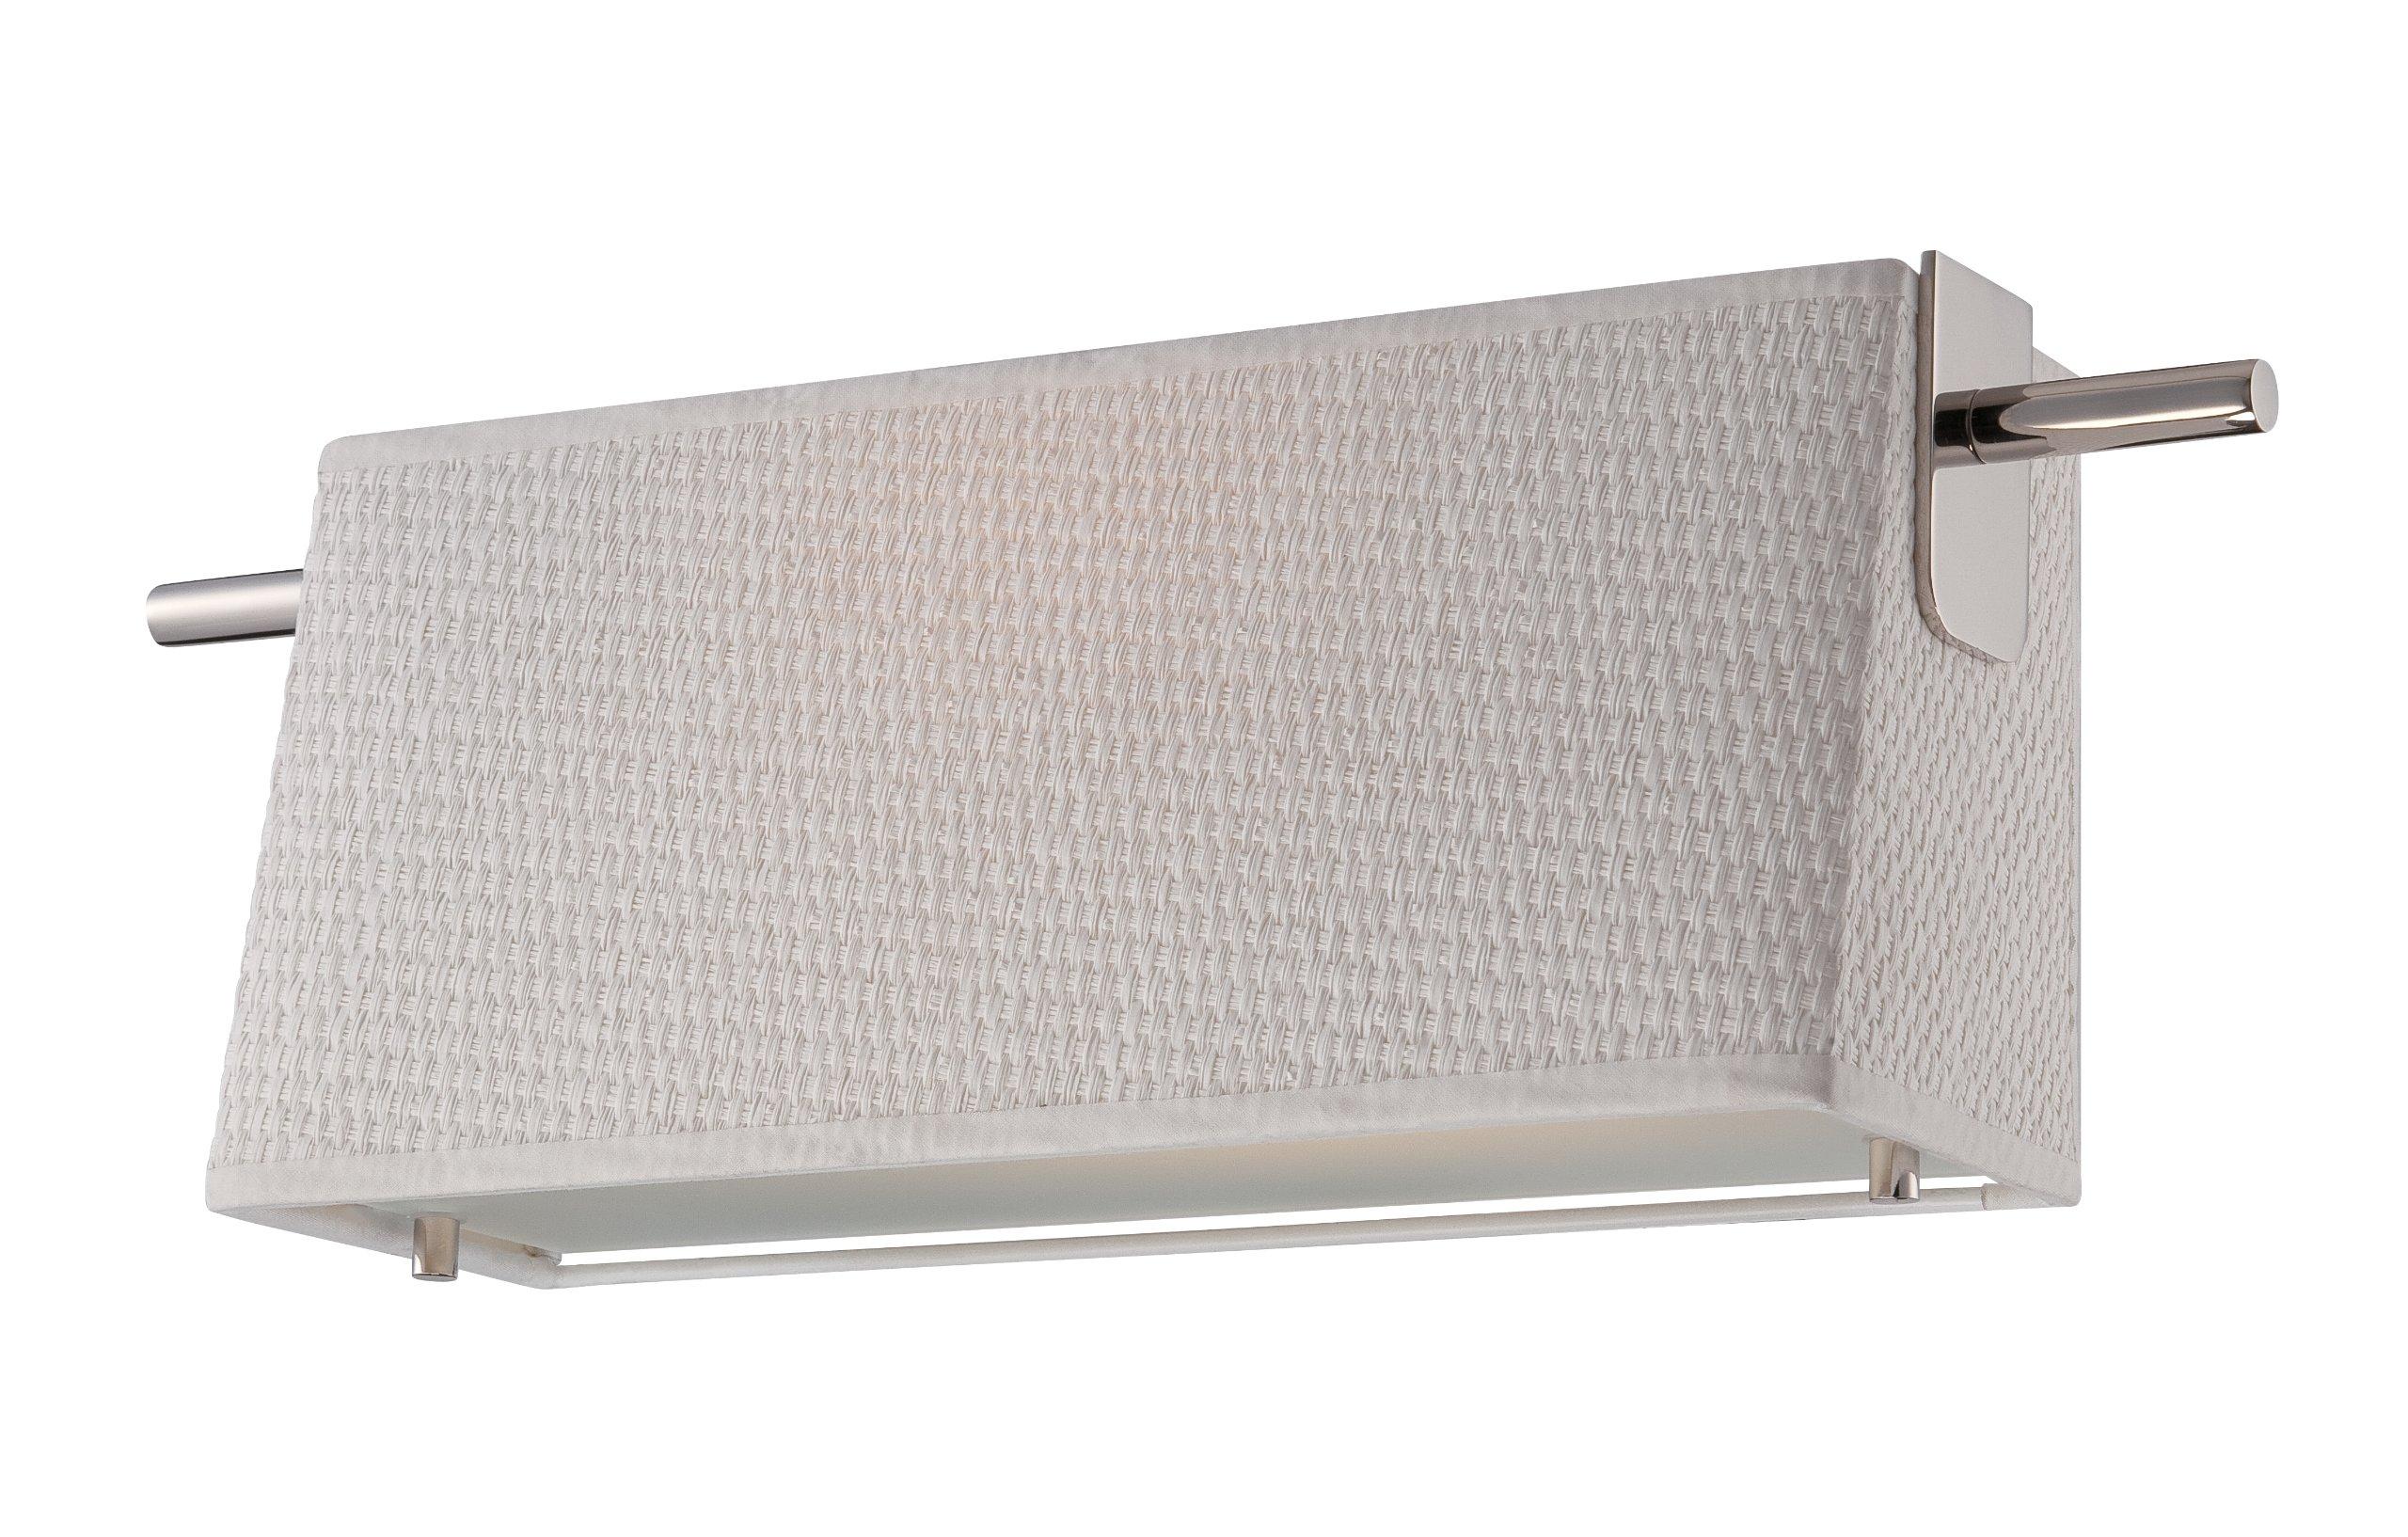 Nuvo Lighting 62/191 Claire LED One Light Wall Sconce 4.8 Watt 285 Lumens Soft White 2700K KolourOne LED Technology White Fabric Shade Polished Nickel Fixture